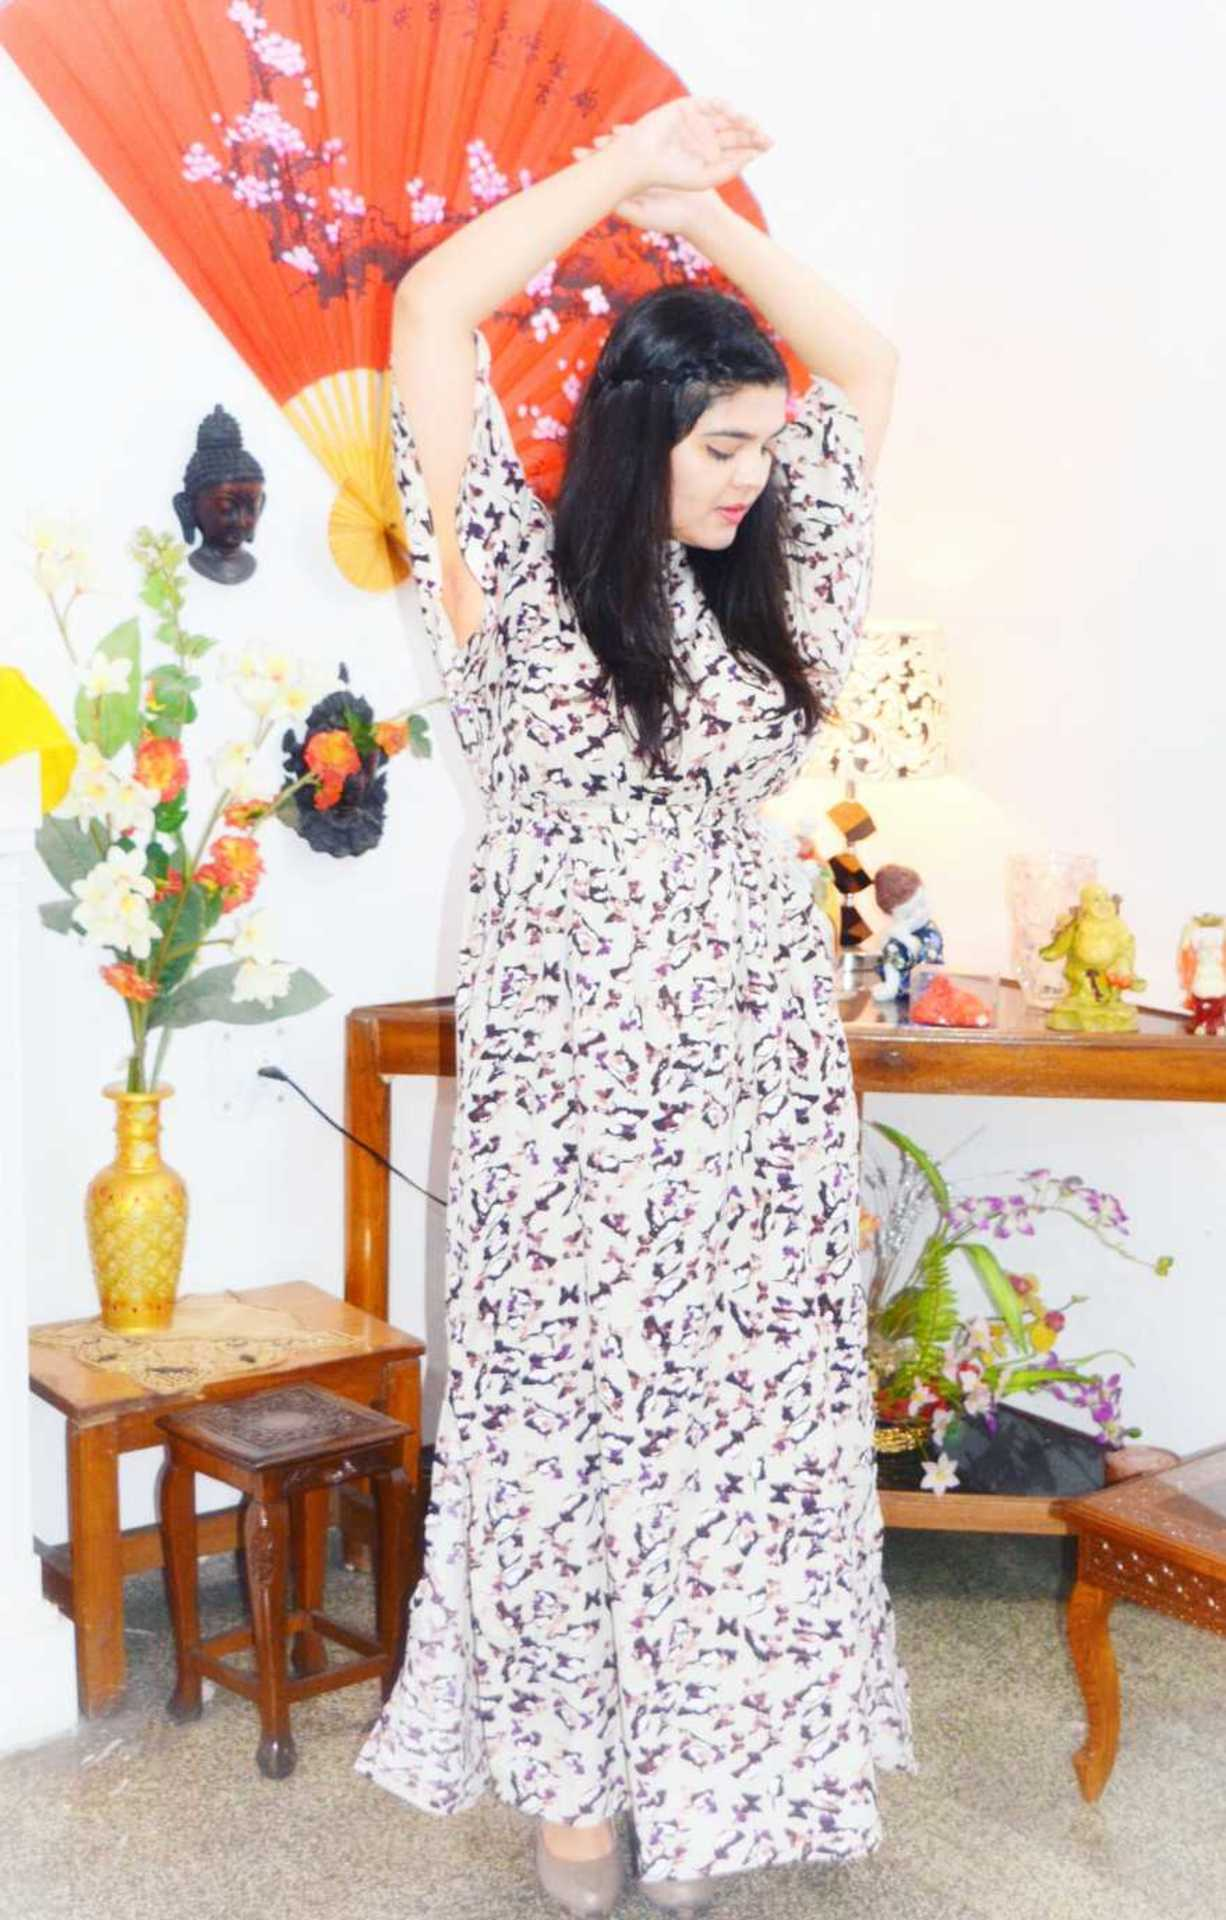 The Gypsy Girl Things - IMG_20180116_1